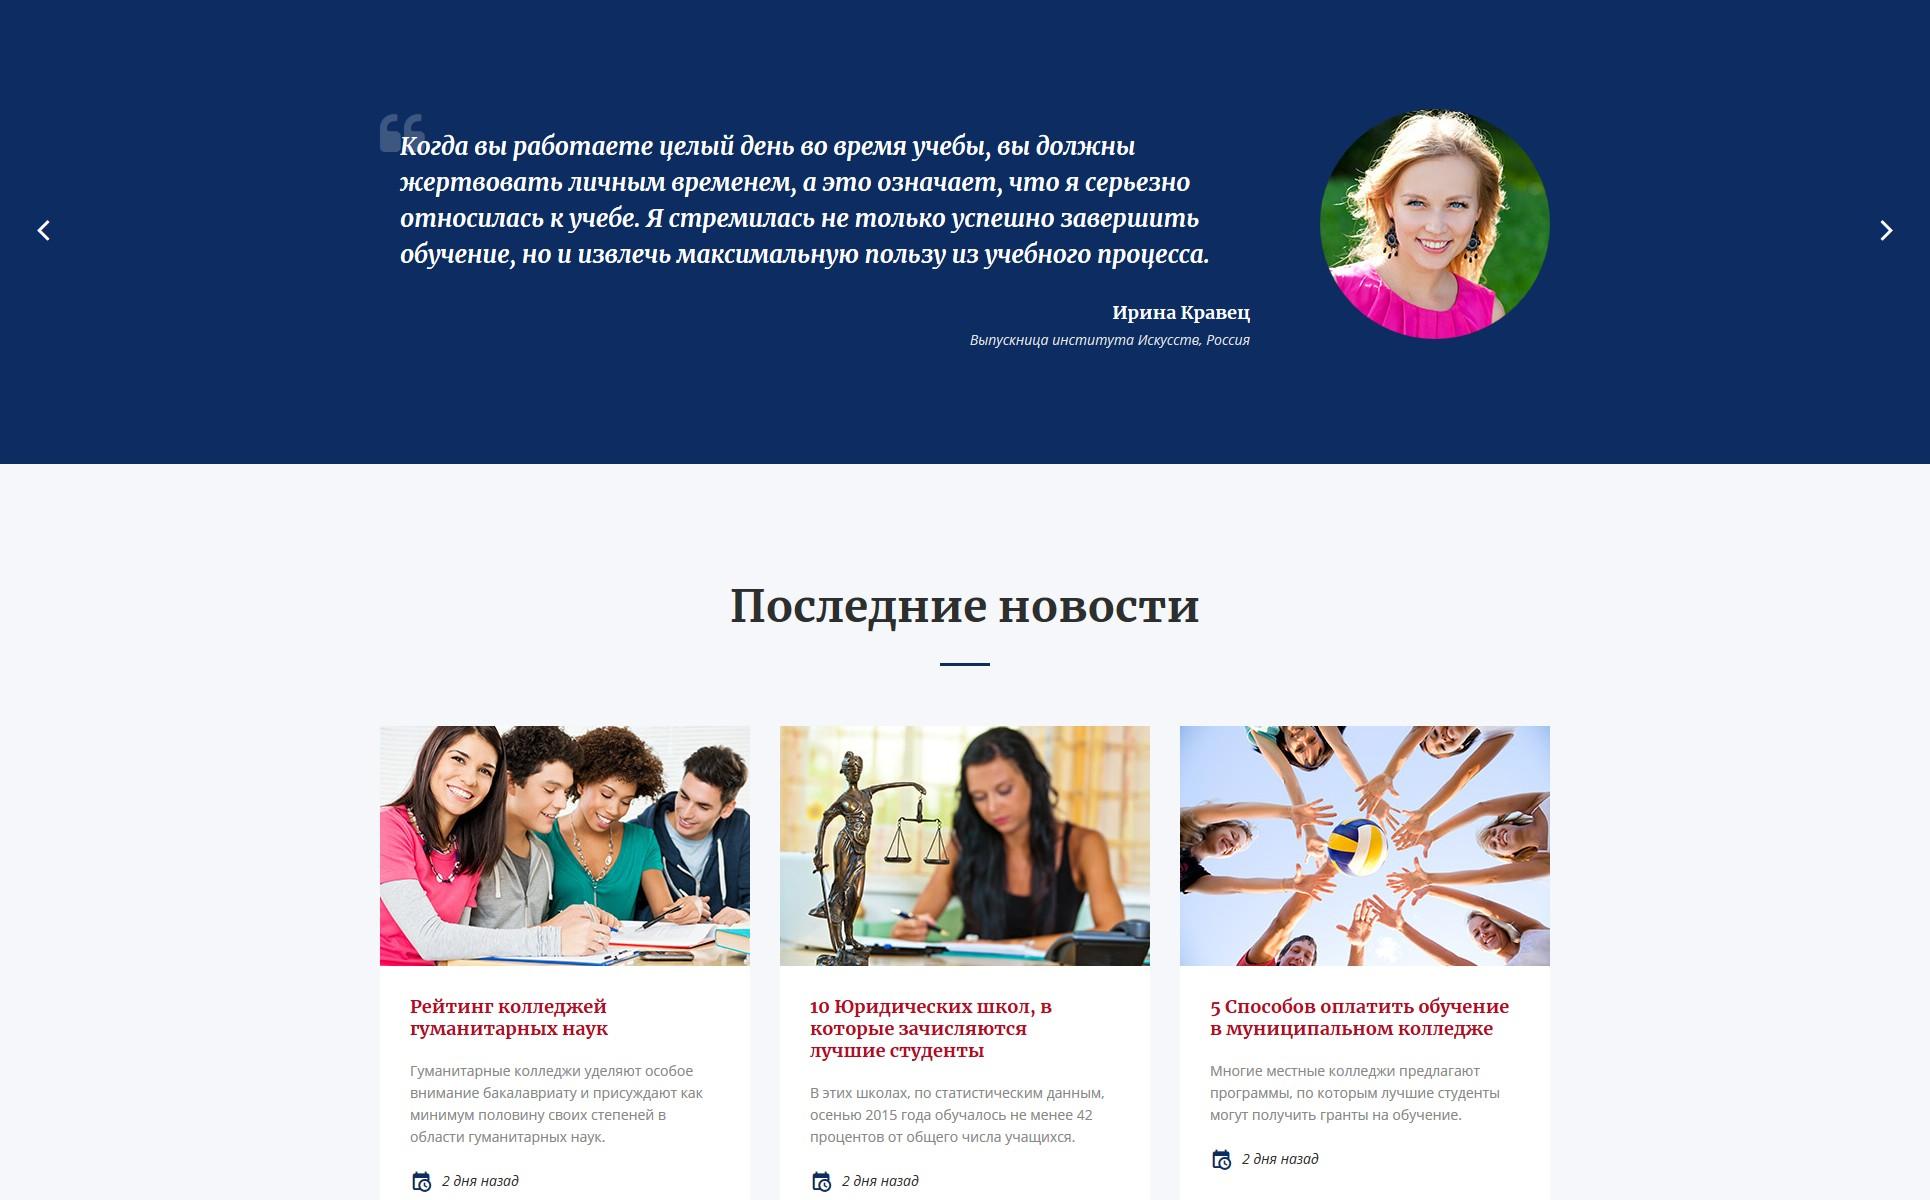 https://s3u.tmimgcdn.com/1519369-1548169845886_Image-03.jpg